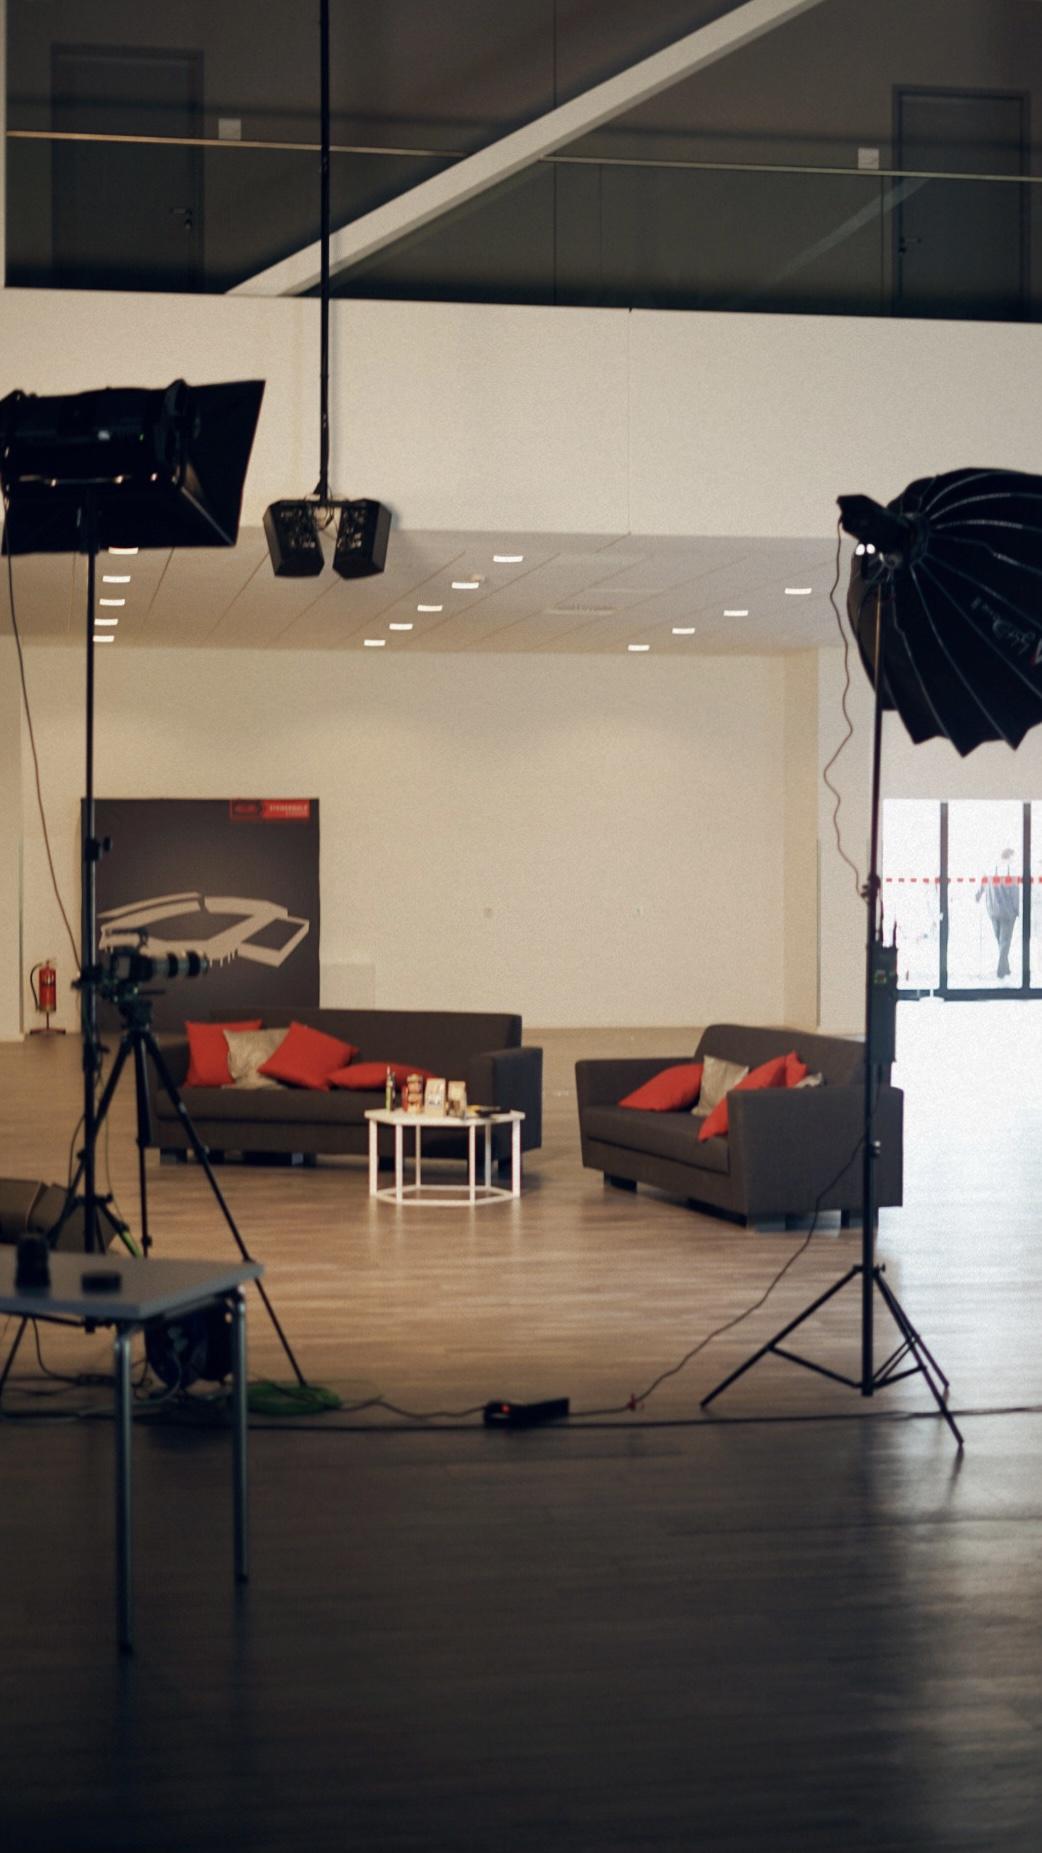 Bilder Investor Days Thueringen - 04